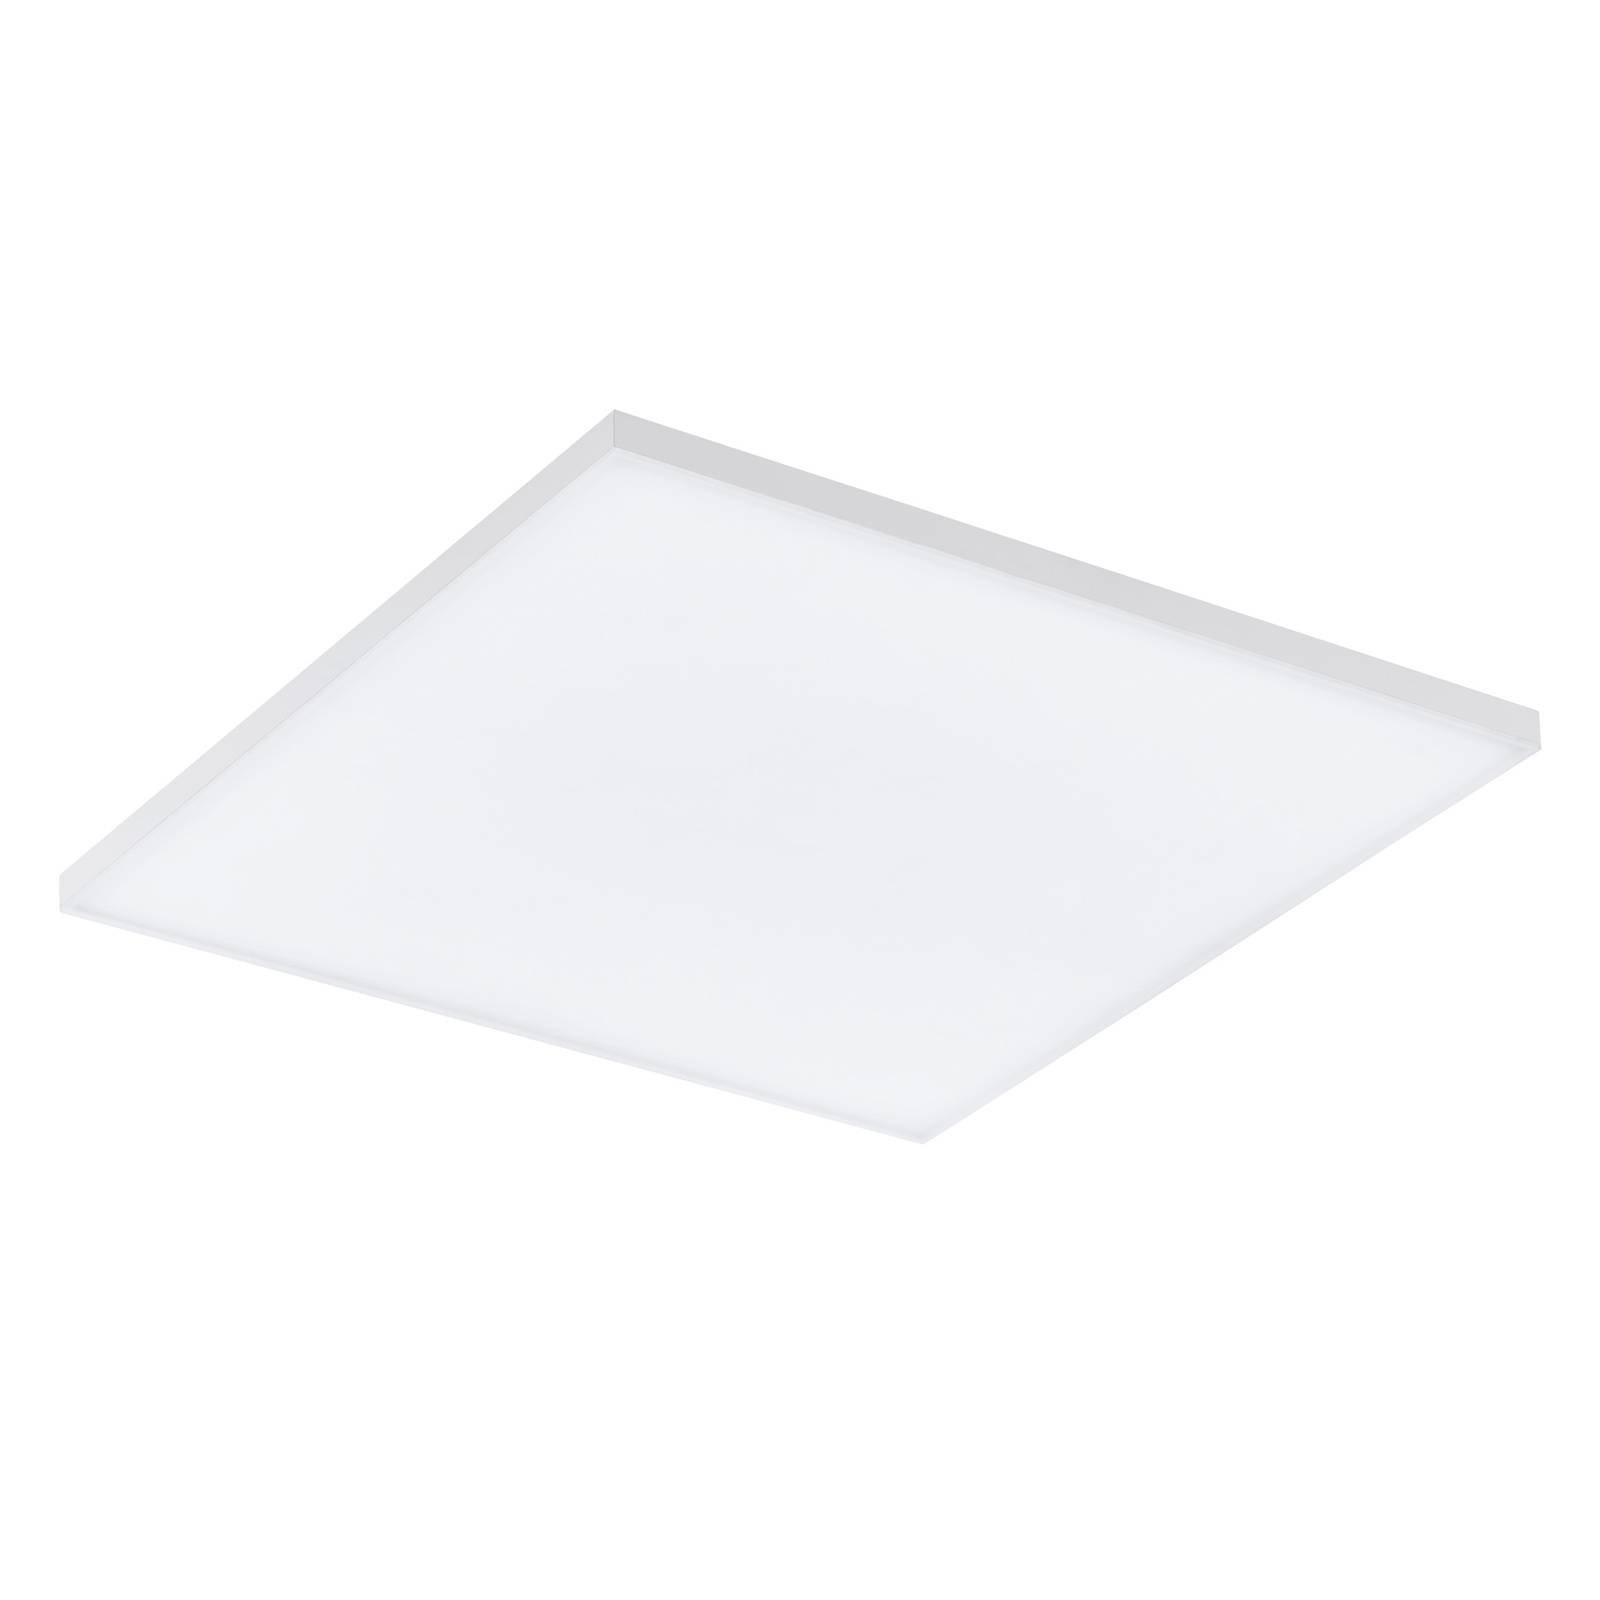 LED-taklampe Turcona, 45 x 45 cm